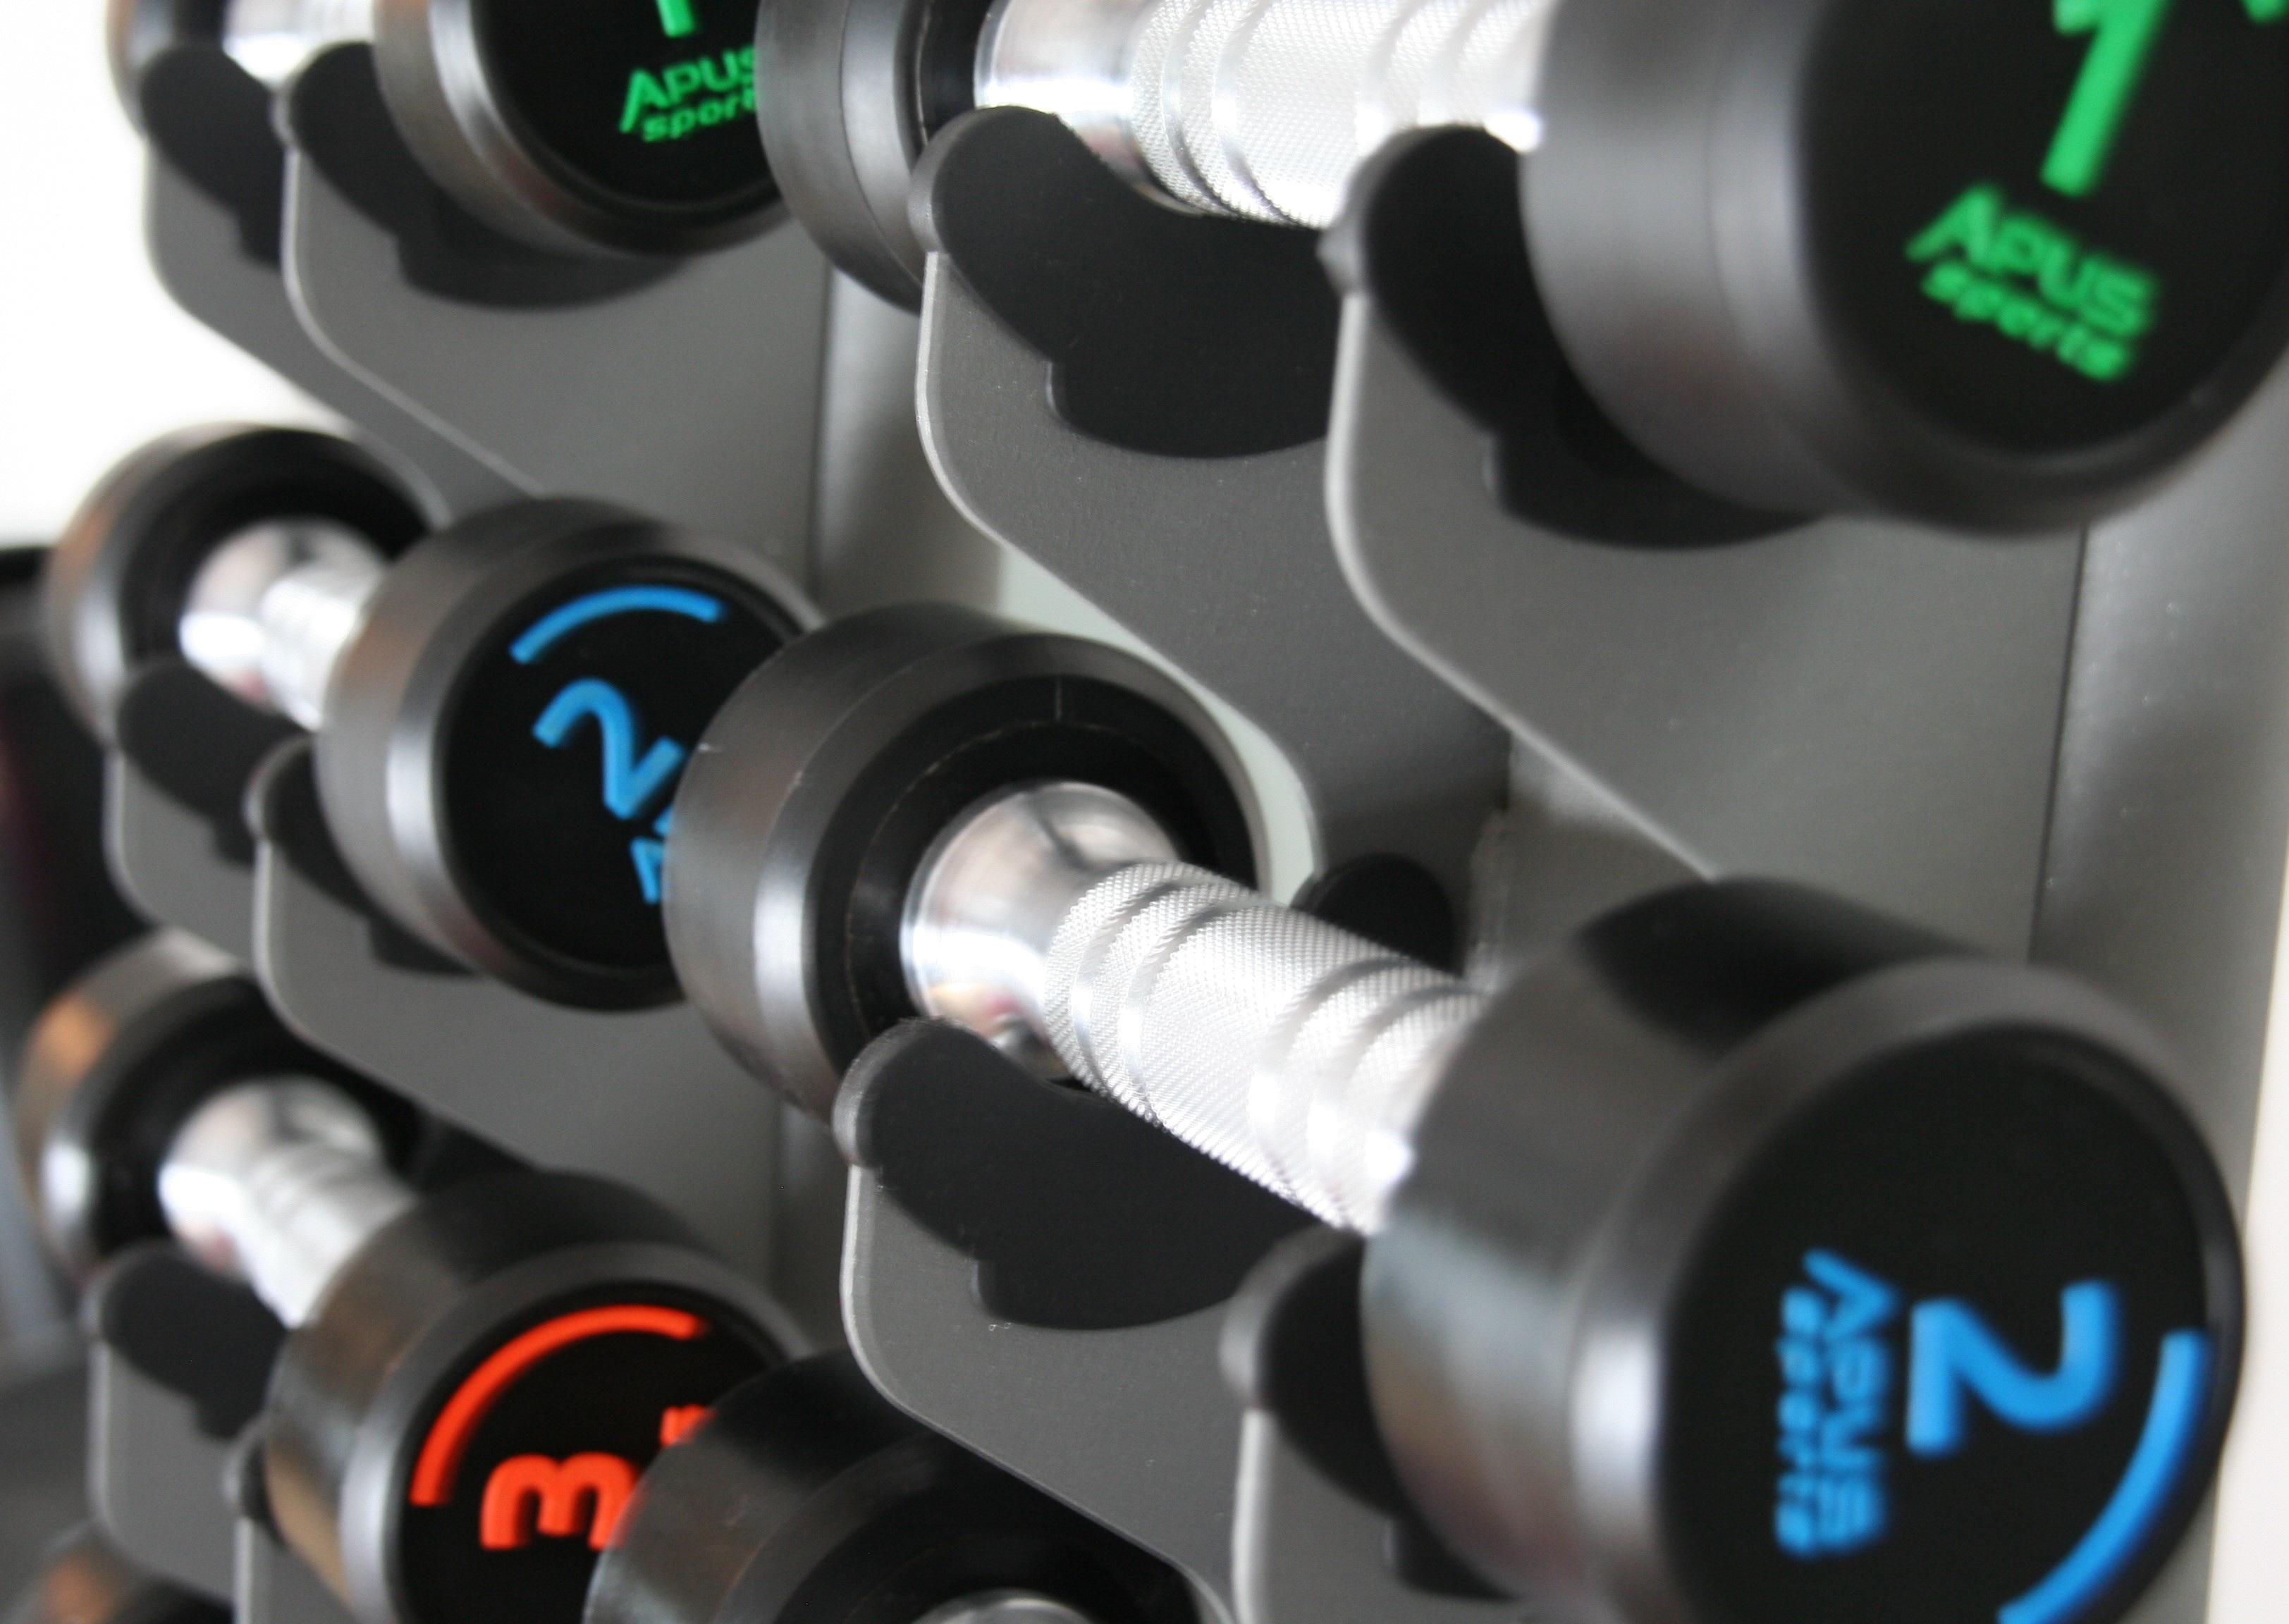 Omtalade Bakgrundsbilder : hjul, träning, kondition, Gym, produkt, vikter PL-25